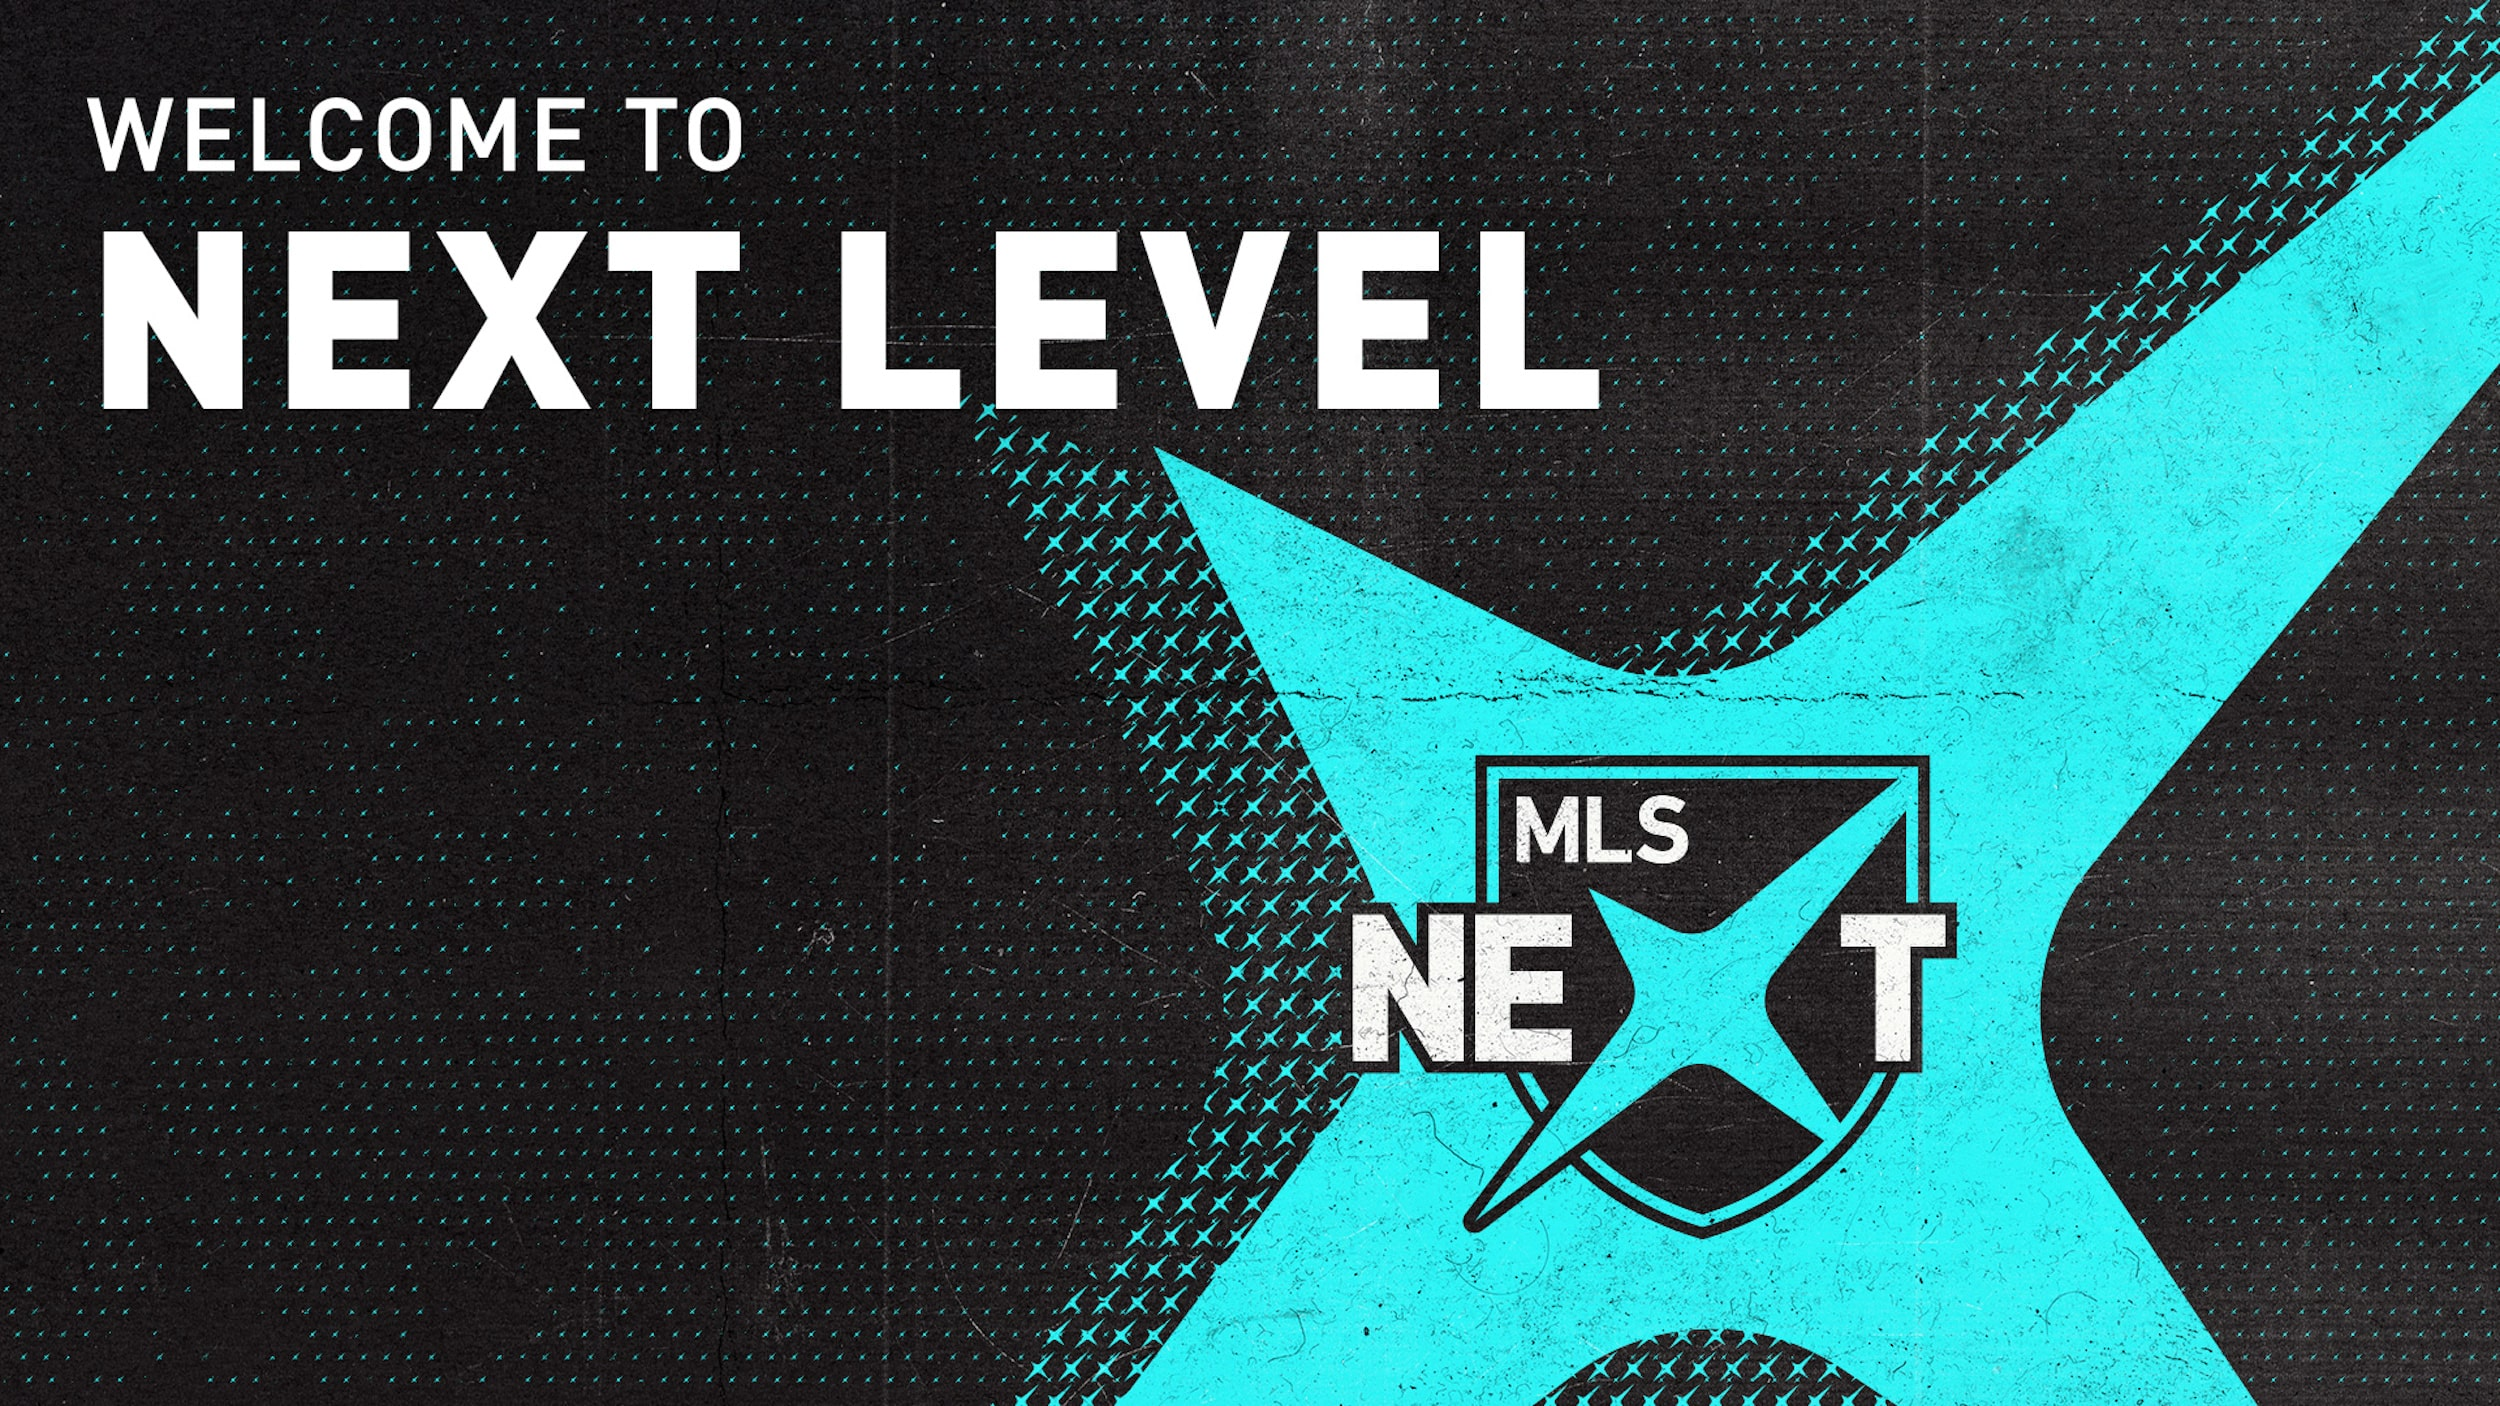 Ballistic MLS Next teams battle with Silicon Valley SA teams!